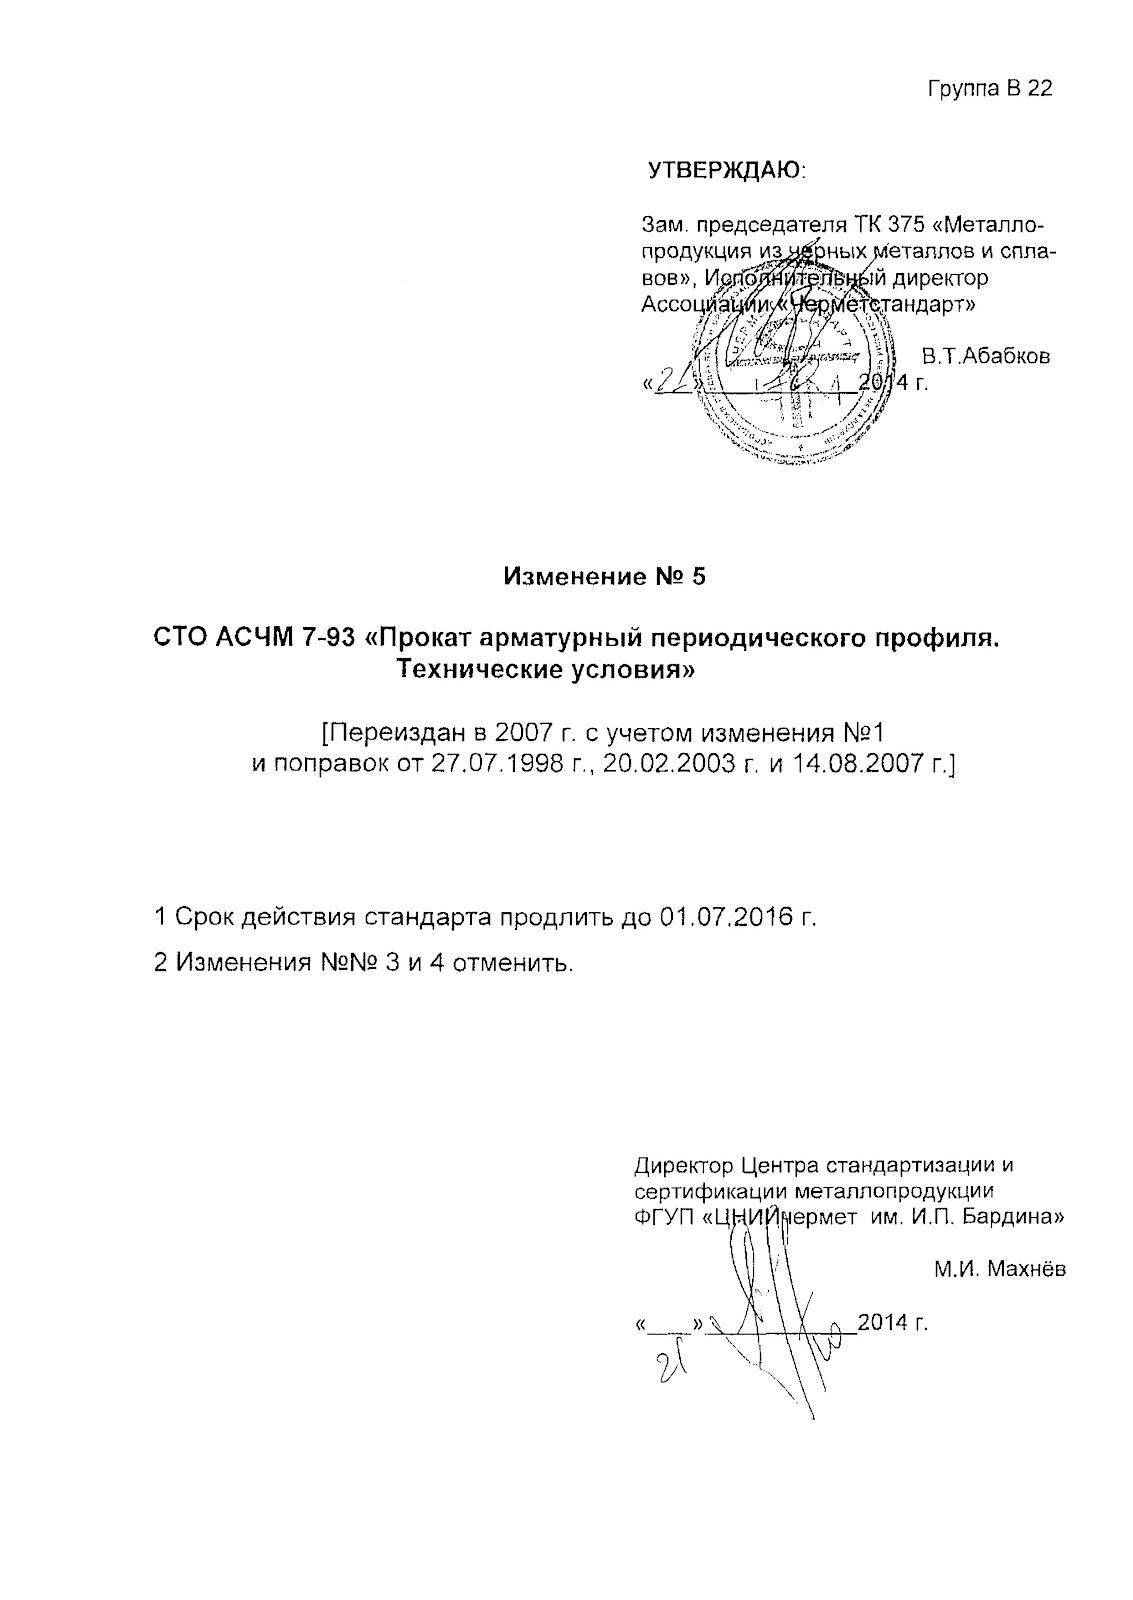 срок действия СТО АСЧМ 7-93. Черметстандарт